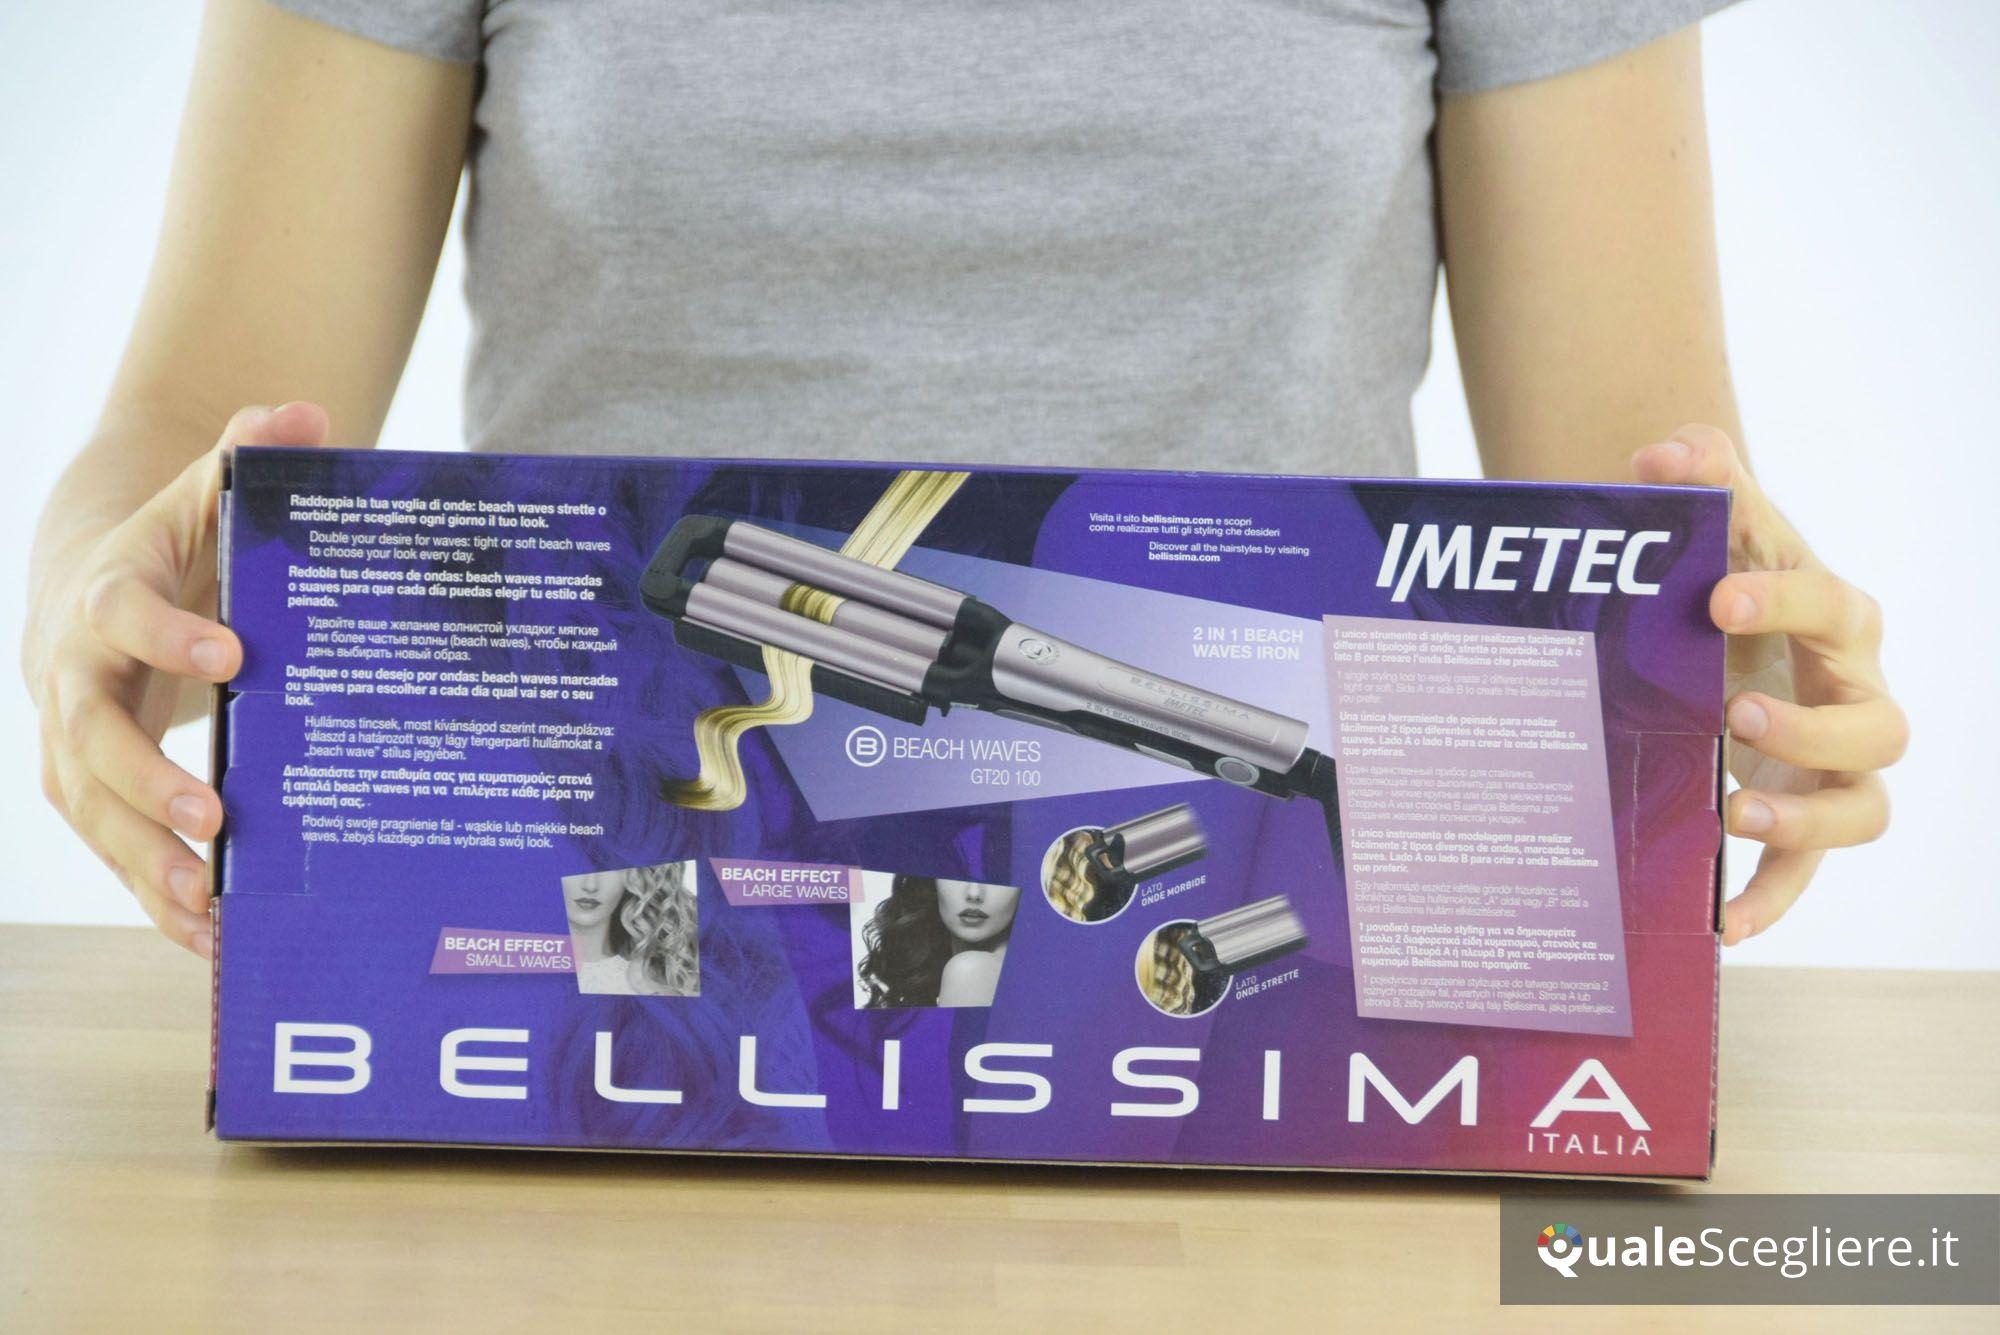 ▷ Recensione Imetec Bellissima Beach Waves GT20 100  b19ea6d6c6a